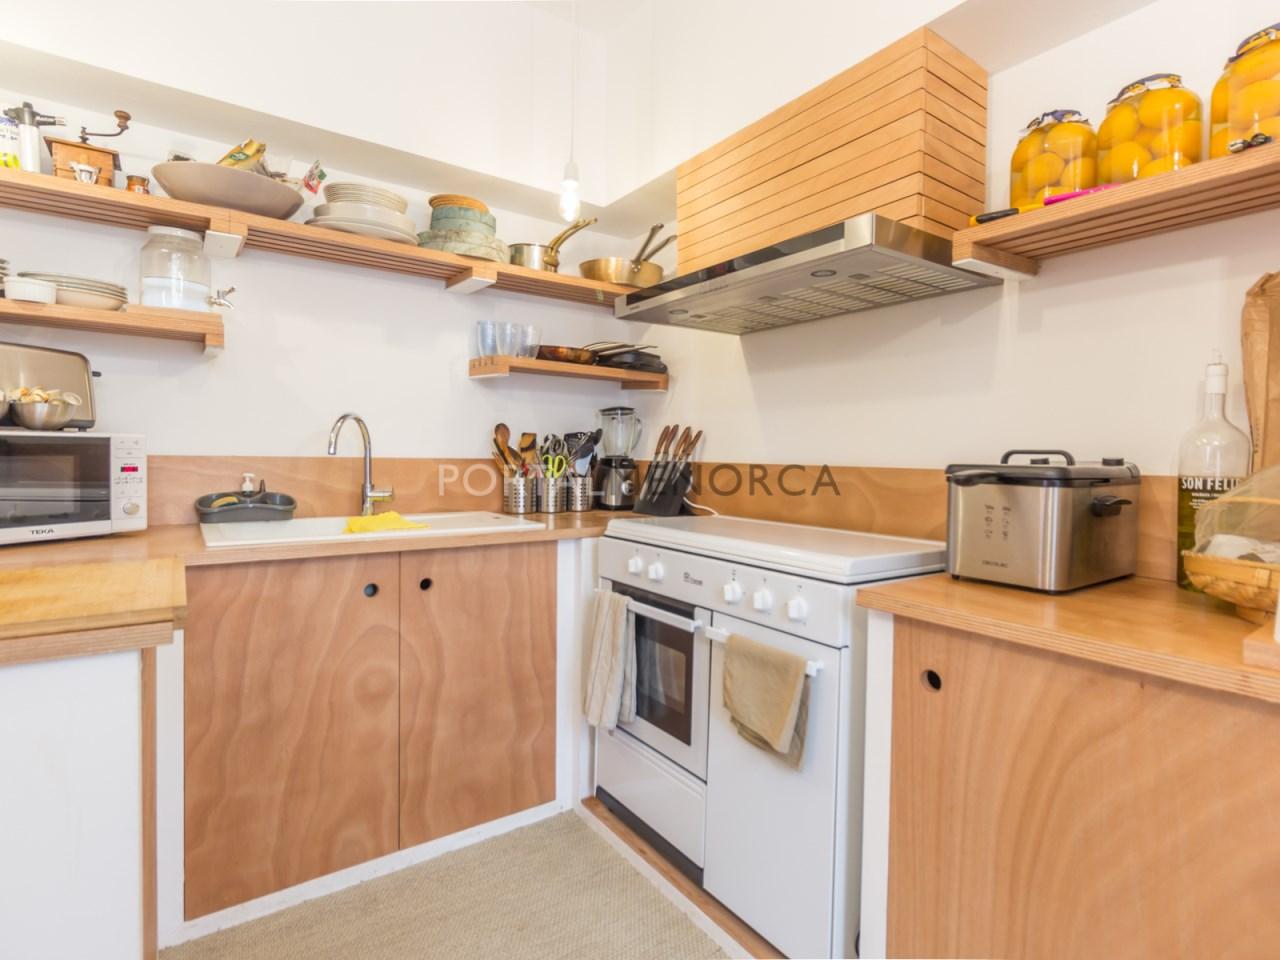 maison a vendre centre de Ciutadella de Menorca (7 de 21)